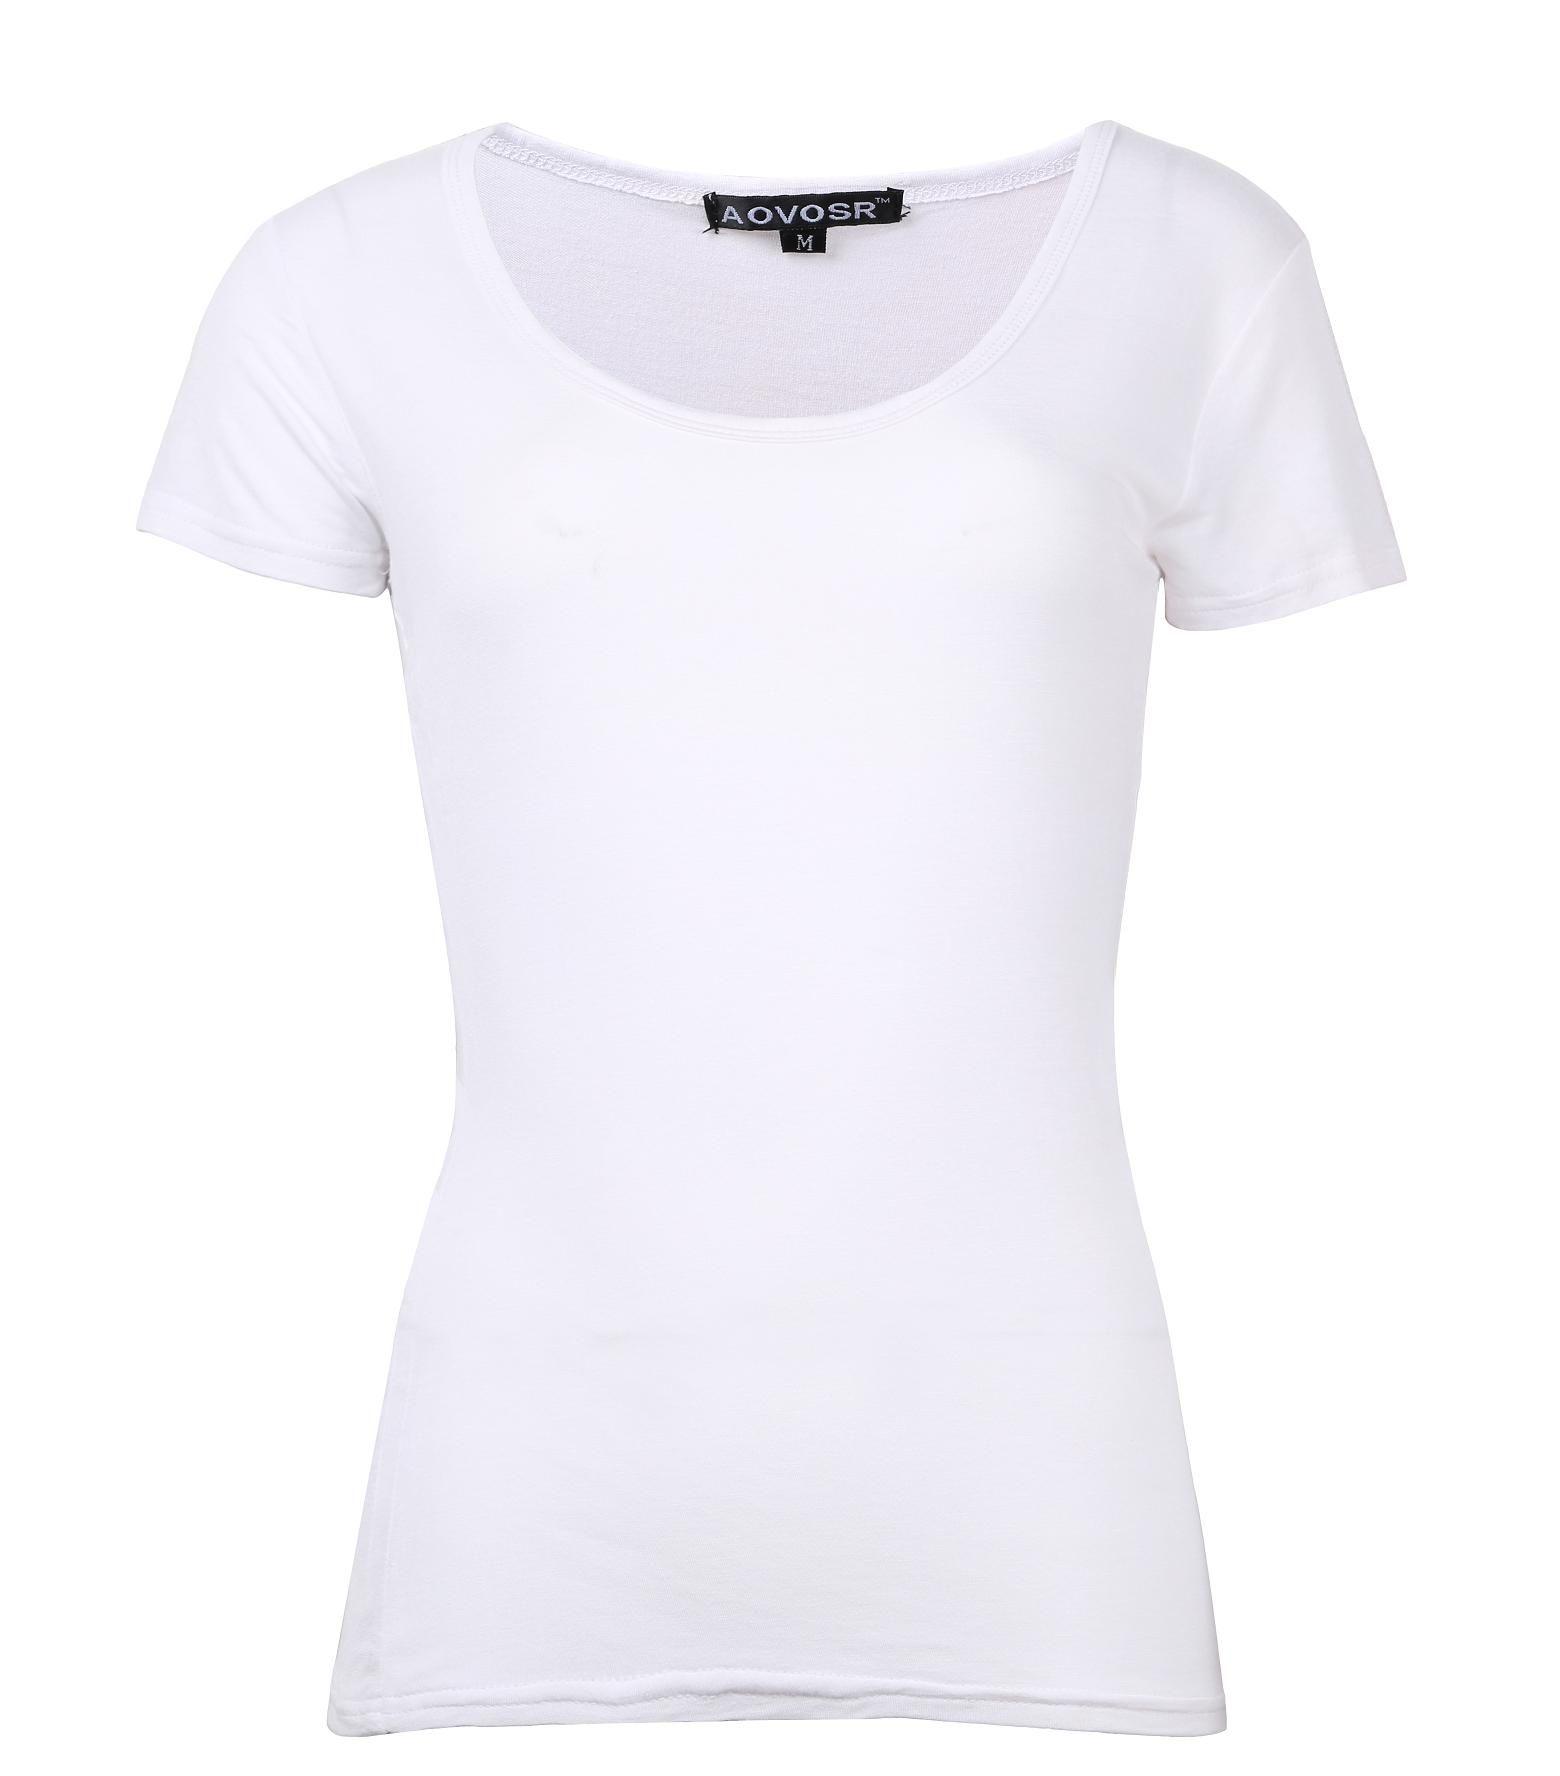 Znalezione obrazy dla zapytania white t shirt women | Nails ...